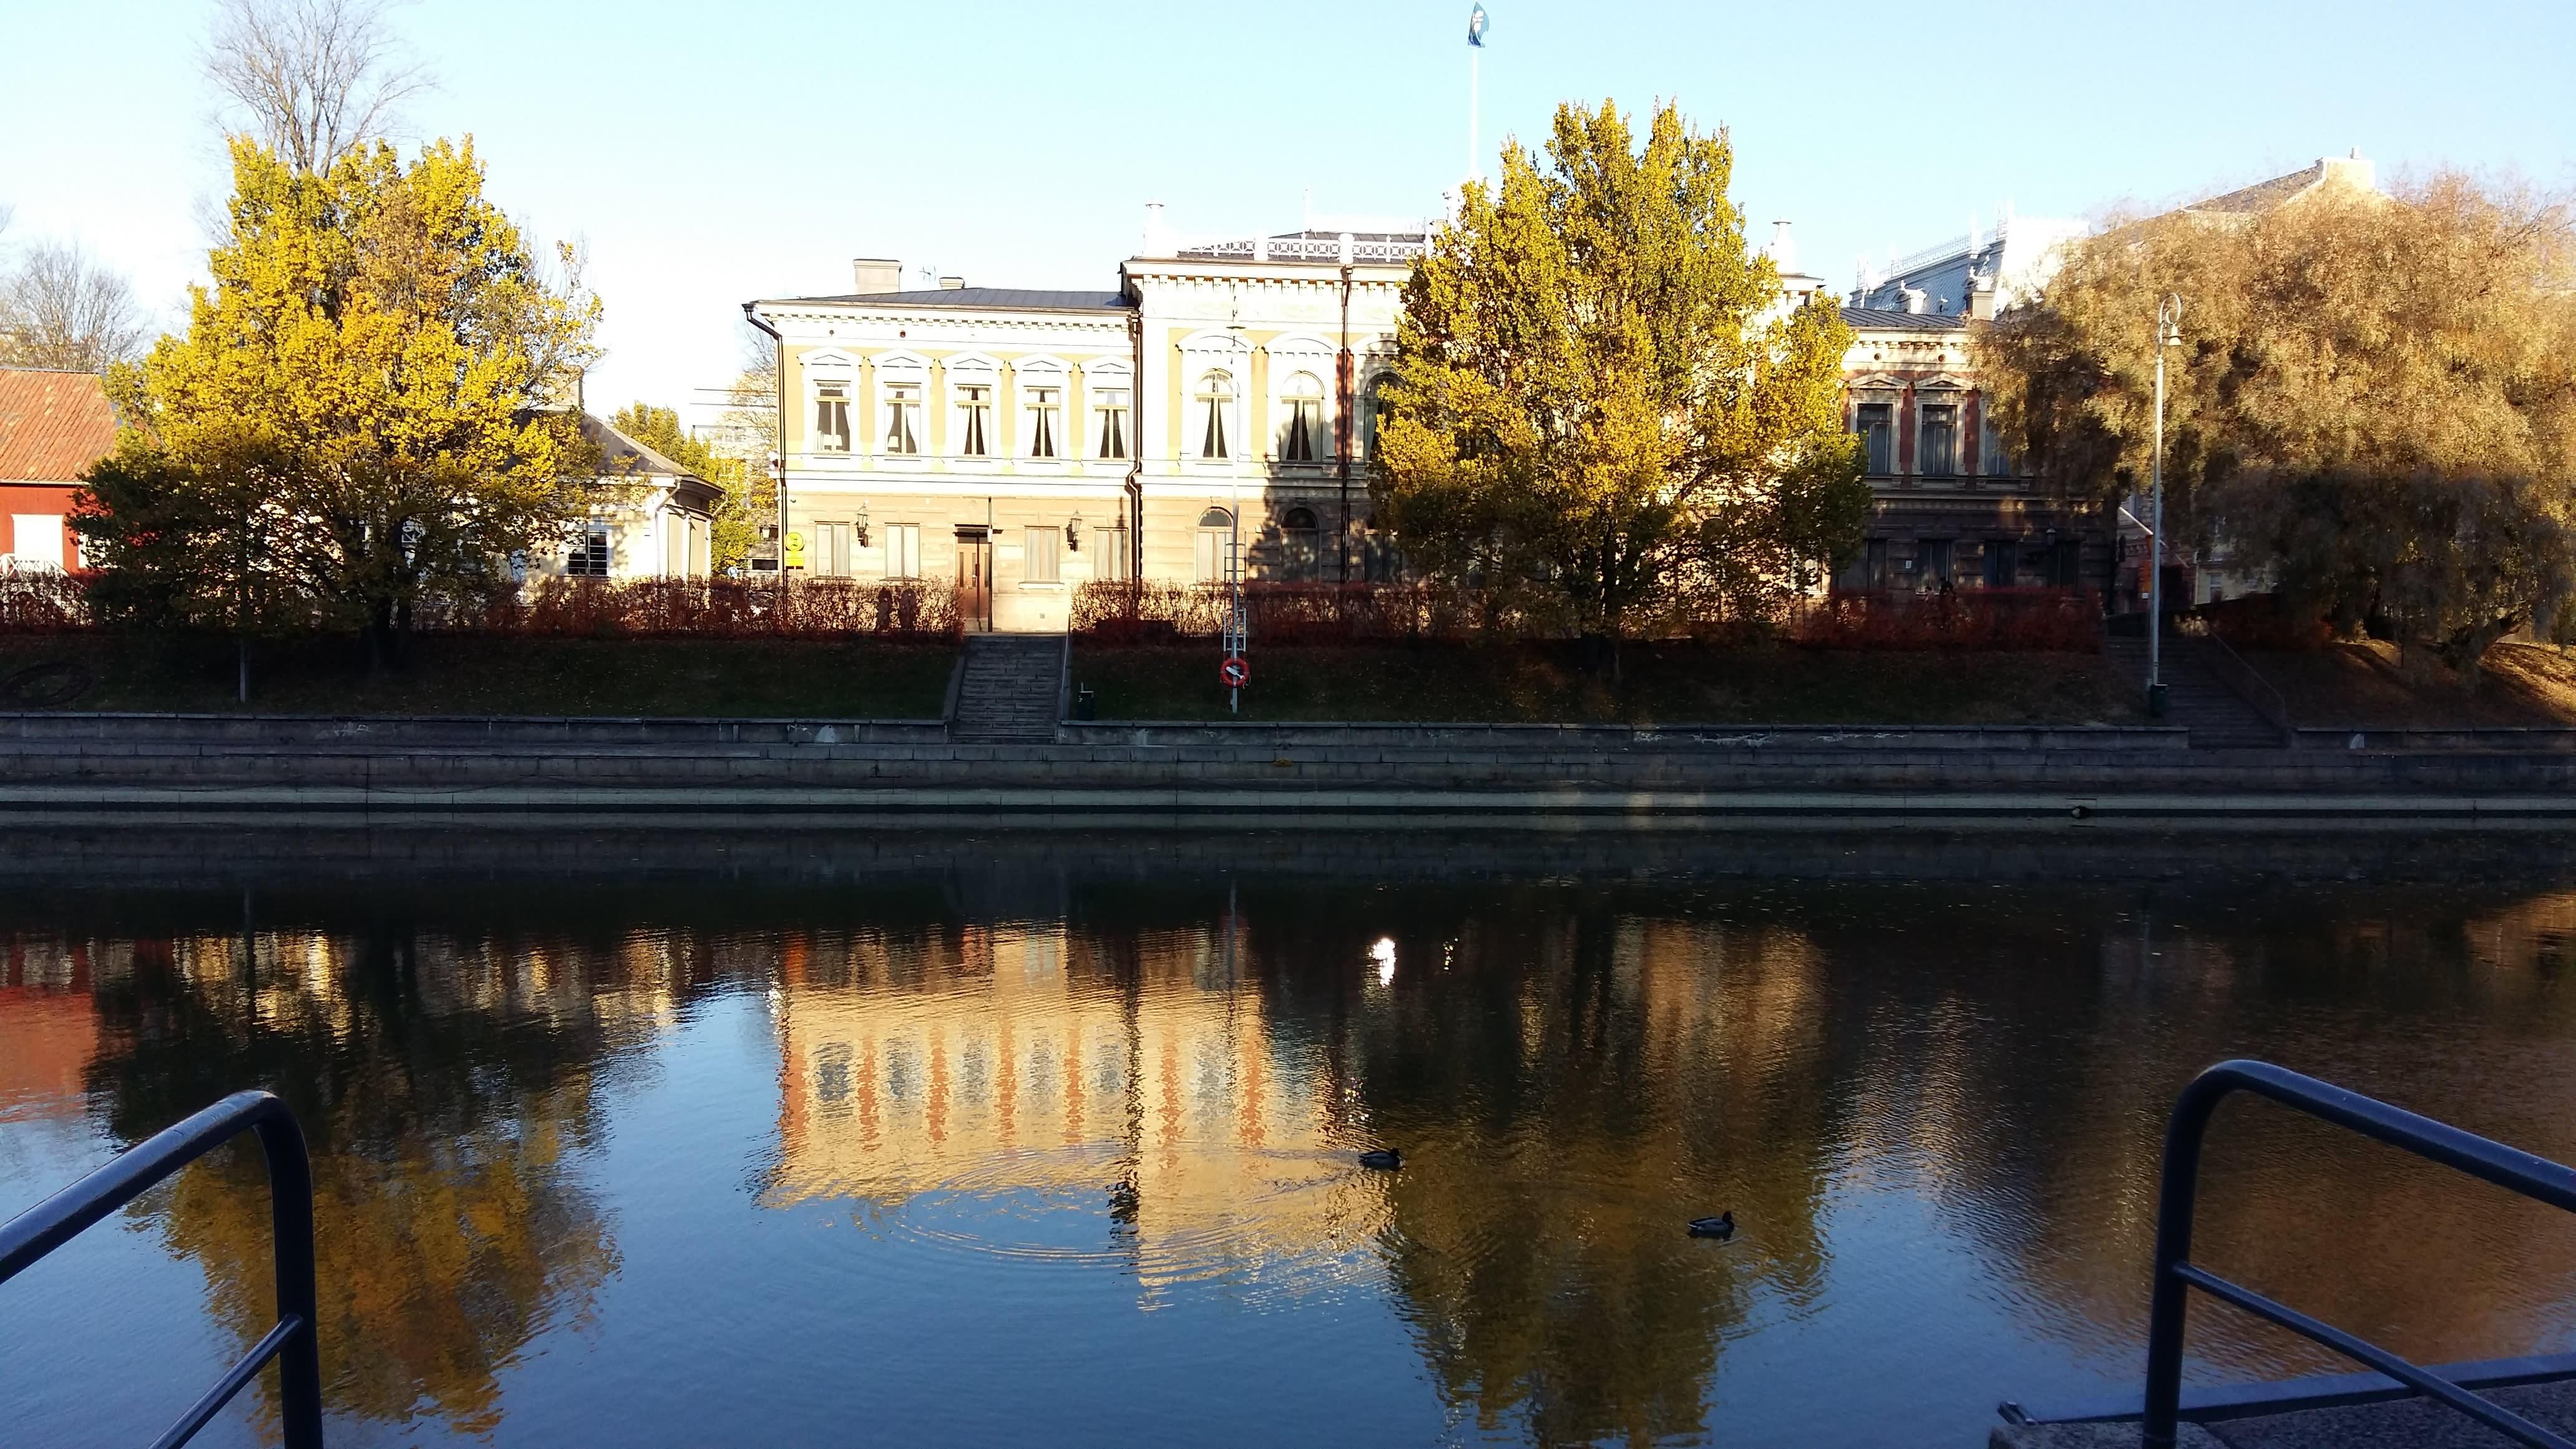 Turun kaupungintalo heijastuu Aurajokeen.